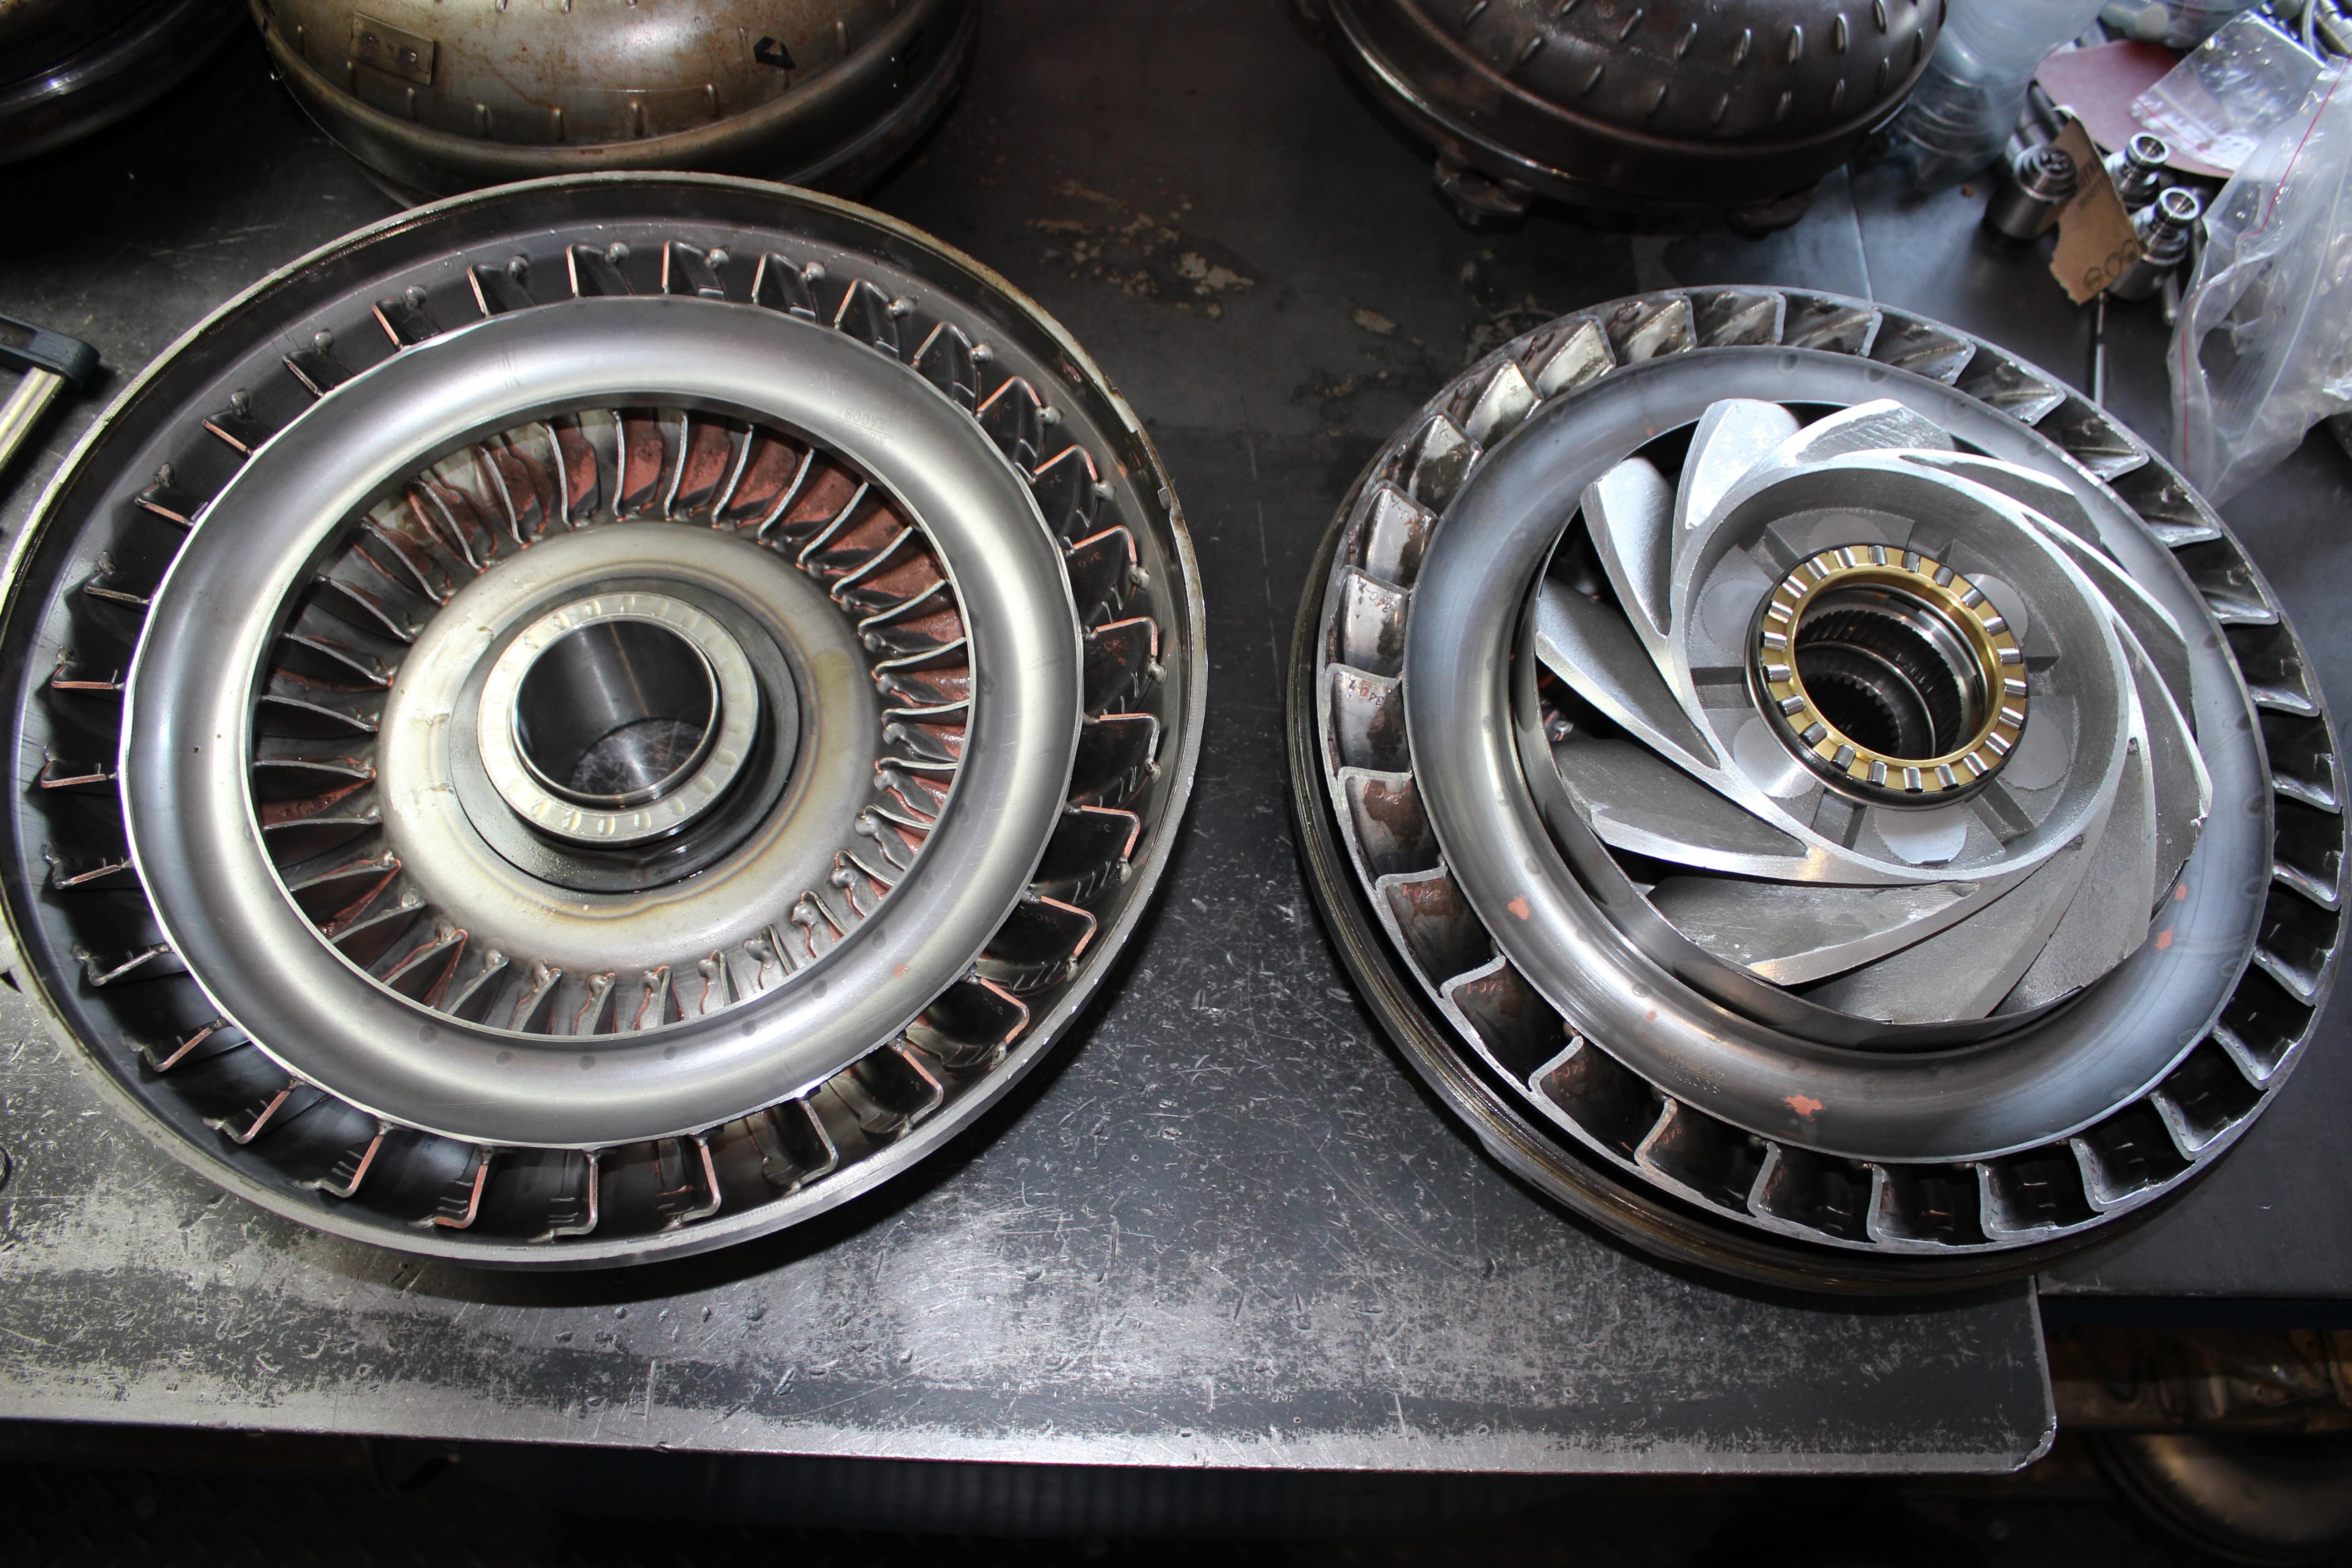 Details about Torque Converter MERCEDES W202, W203 W204 W210 W211 722,6  722,9